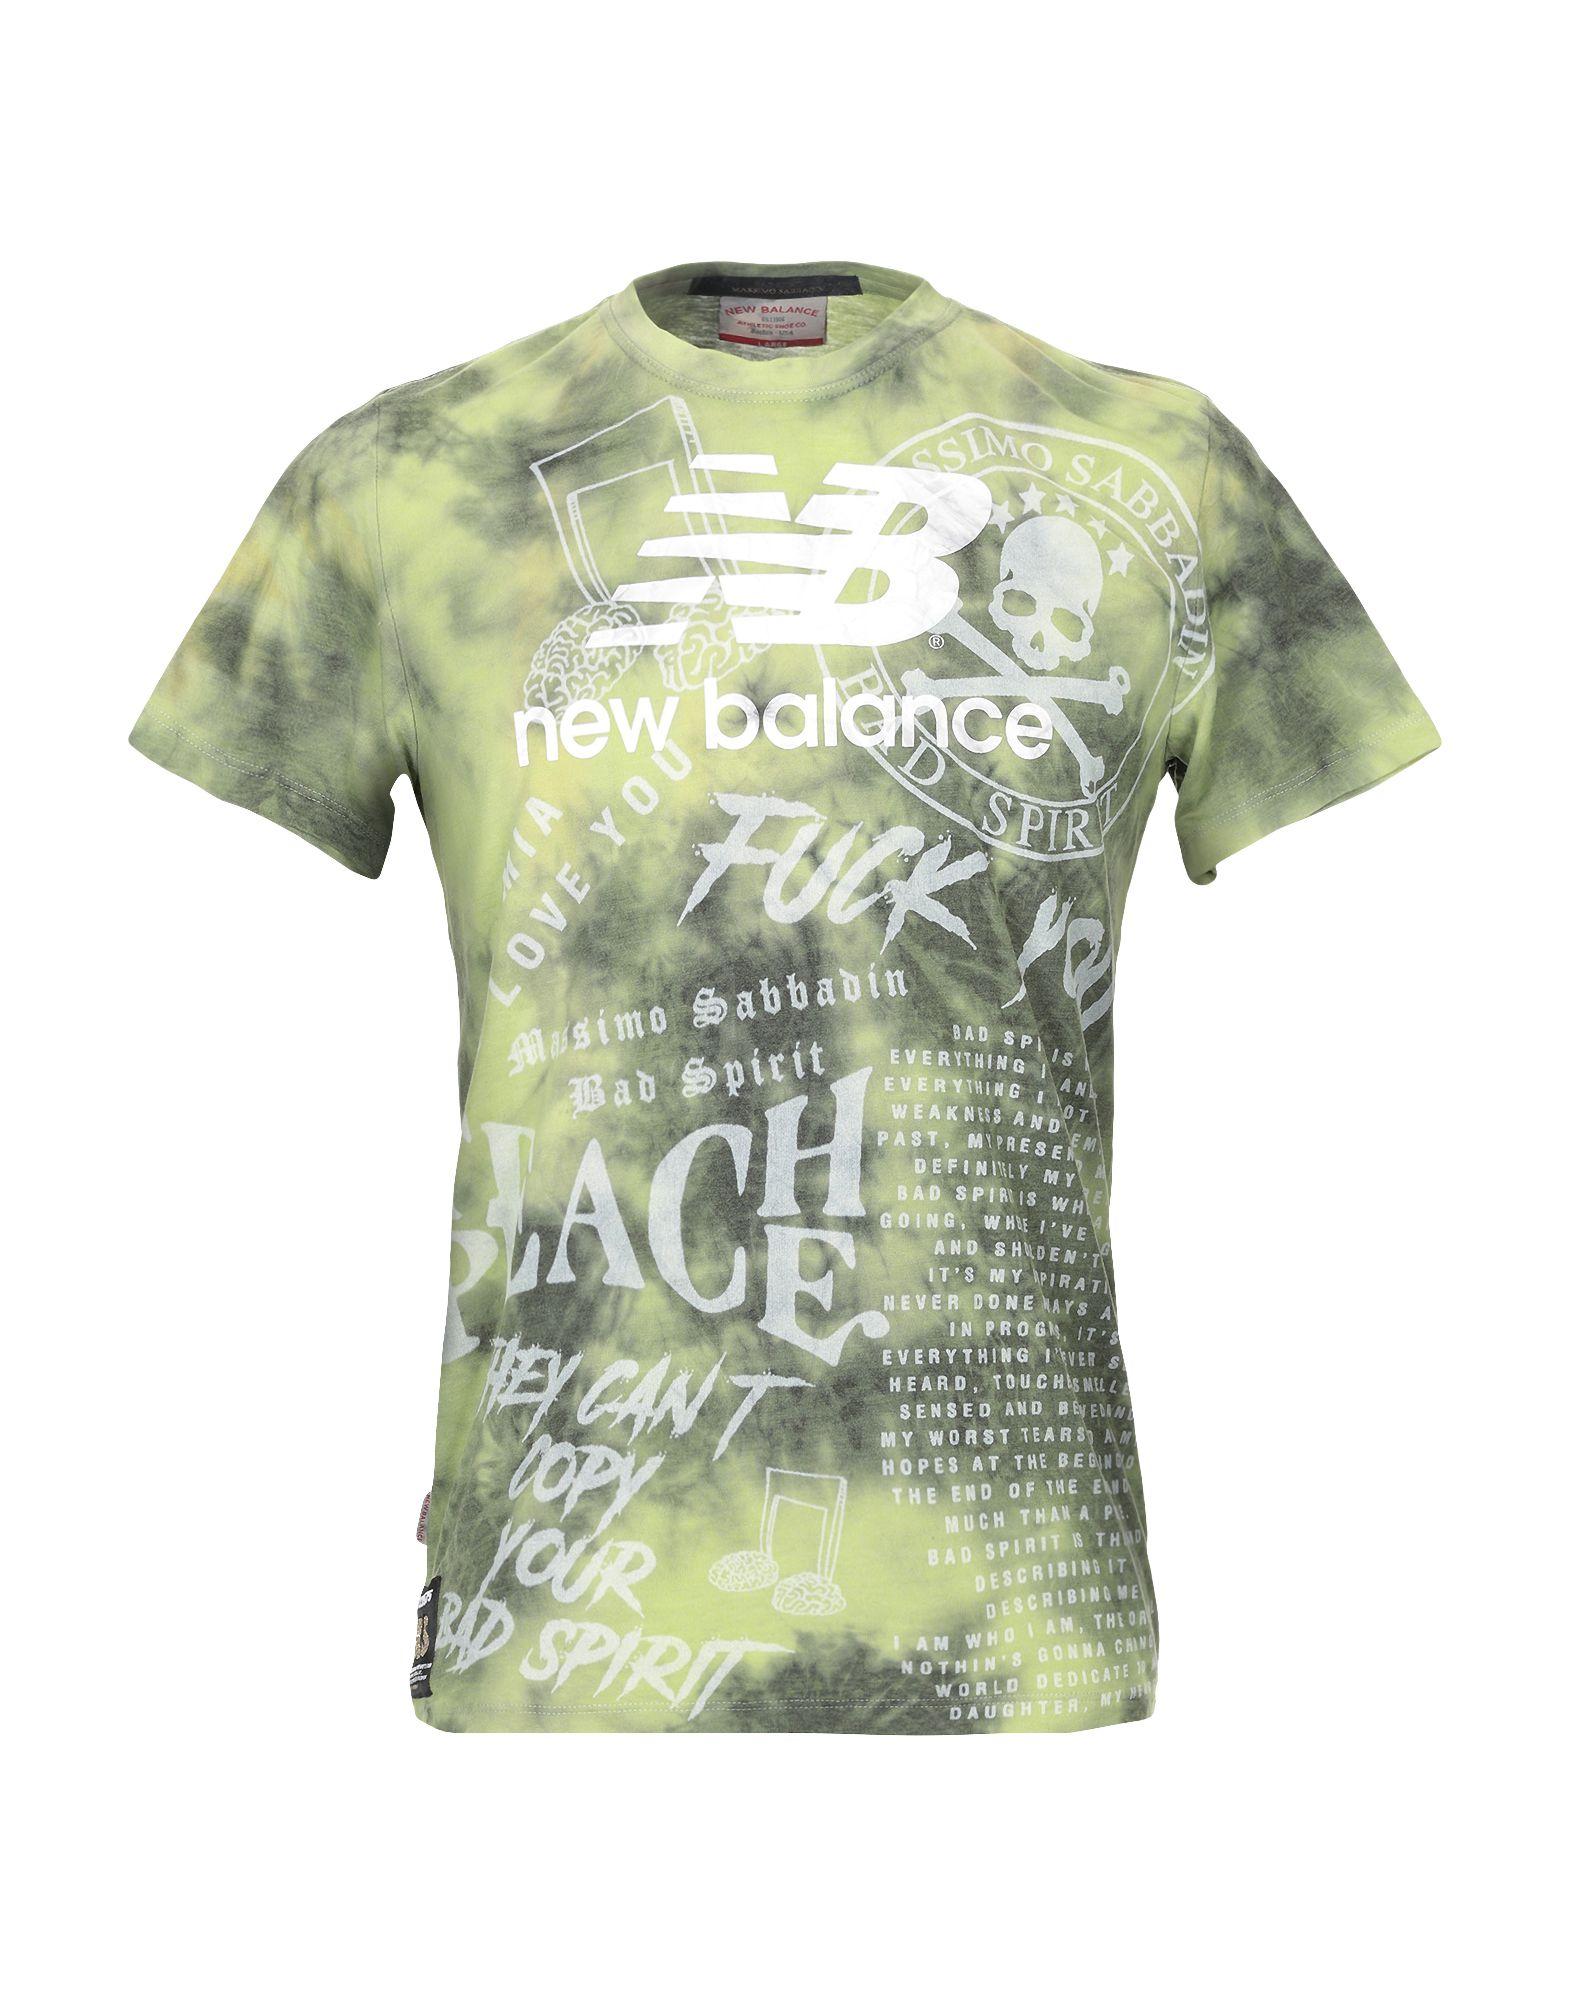 NEW BALANCE x BAD SPIRIT Футболка футболка rebel spirit rebel spirit re032emspj40